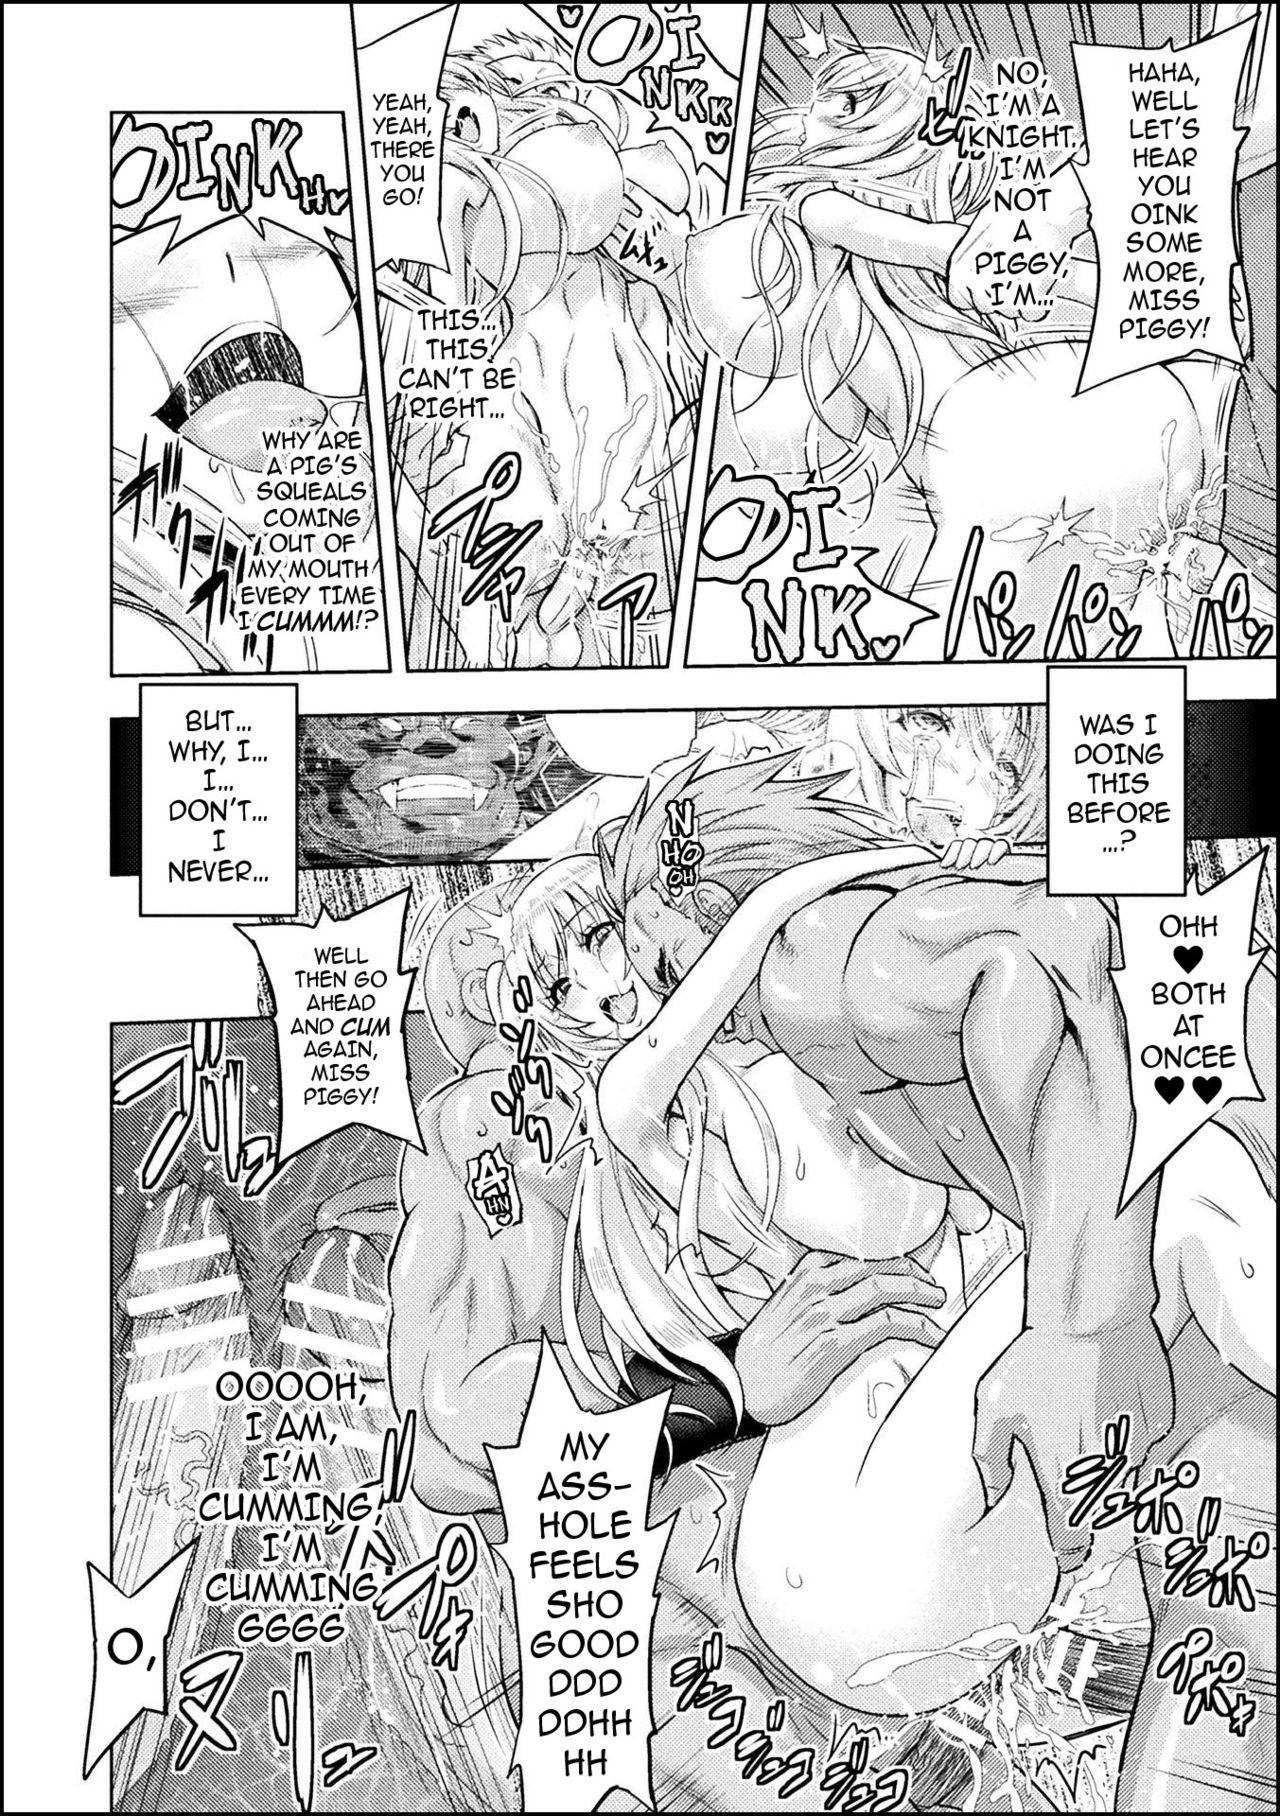 [Yamada Gogogo] Erona ~Orc no Inmon ni Okasareta Onna Kishi no Matsuro~   Erona ~The Fall of a Beautiful Knight Cursed with the Lewd Mark of an Orc~ Ch. 1-6 [English] {darknight} 150